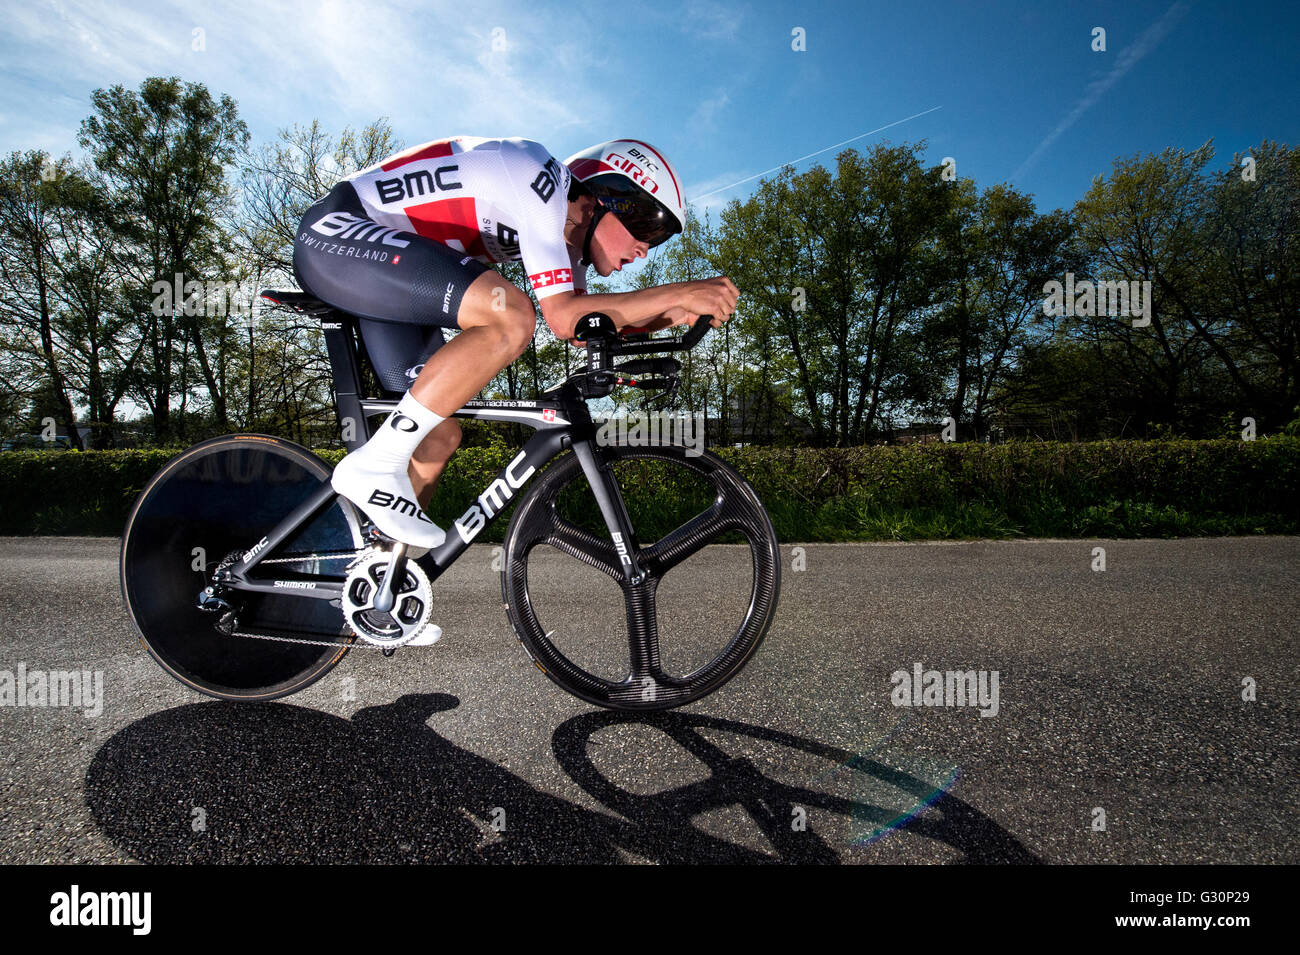 2016 Giro d'Italia. Etapa 1. Tiempo de prueba individual, Apeldoorn. Silvan Dillier (BMC) Imagen De Stock